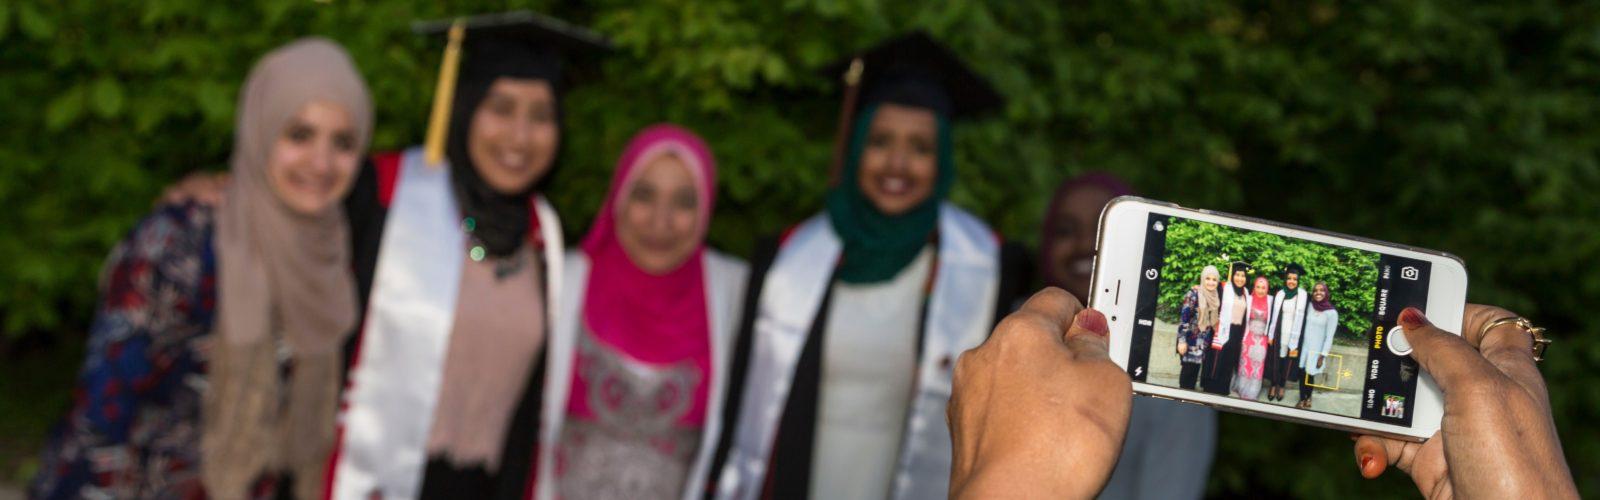 DDEEA 2017 Graduation Friends in a Line (77)